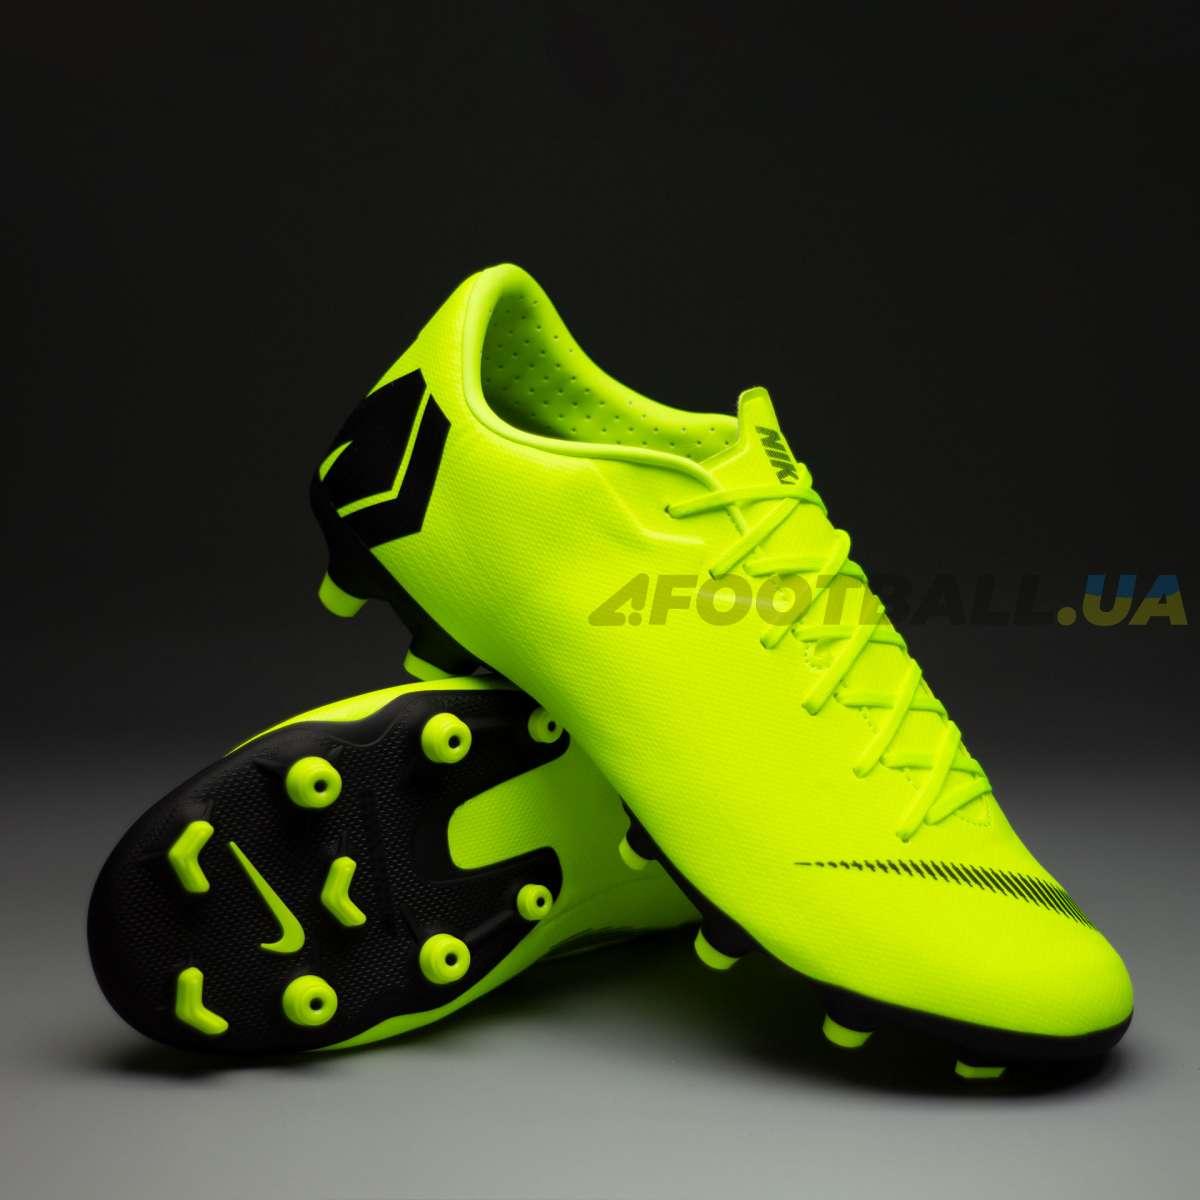 Футбольные бутсы Nike Mercurial Vapor Academy AH7375-701 3ab1c40ed89a3